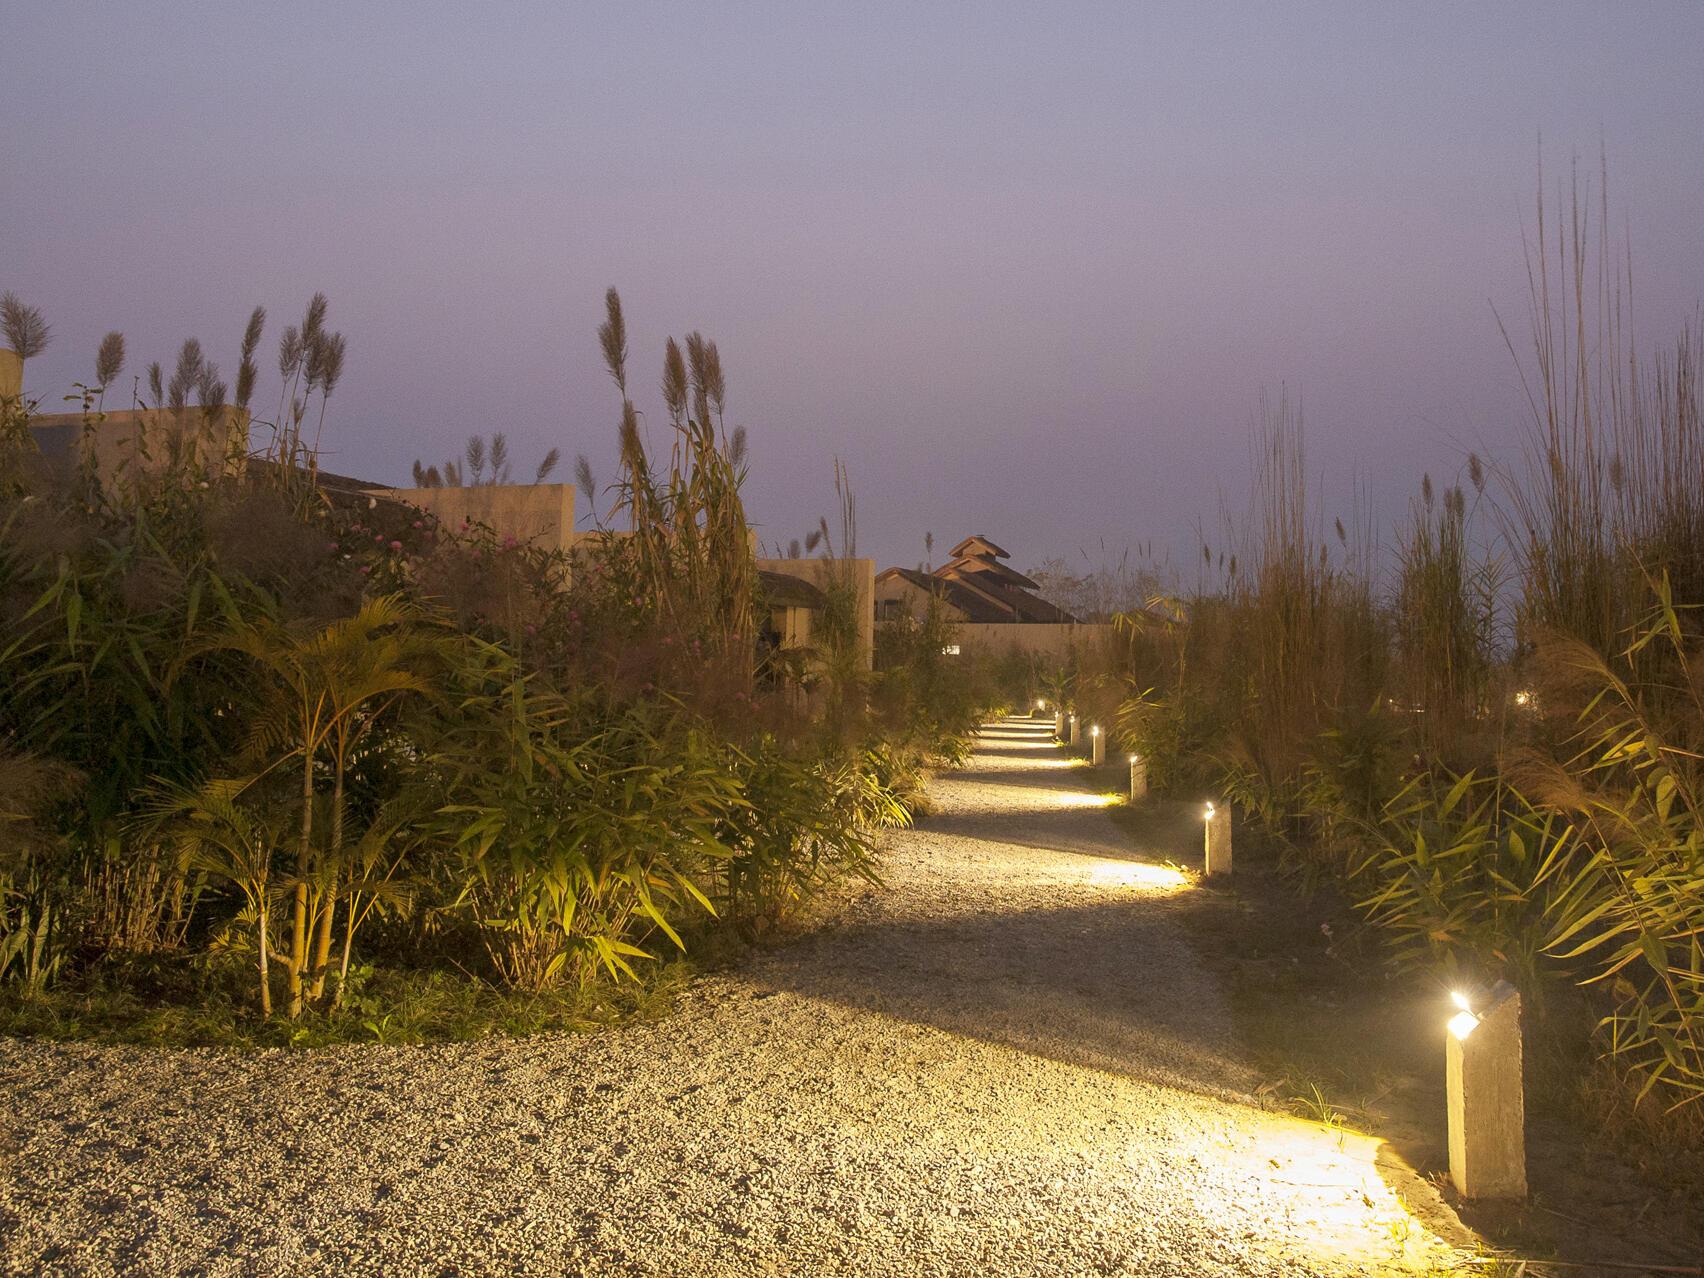 Lightning road  at evening of Meghauli Serai